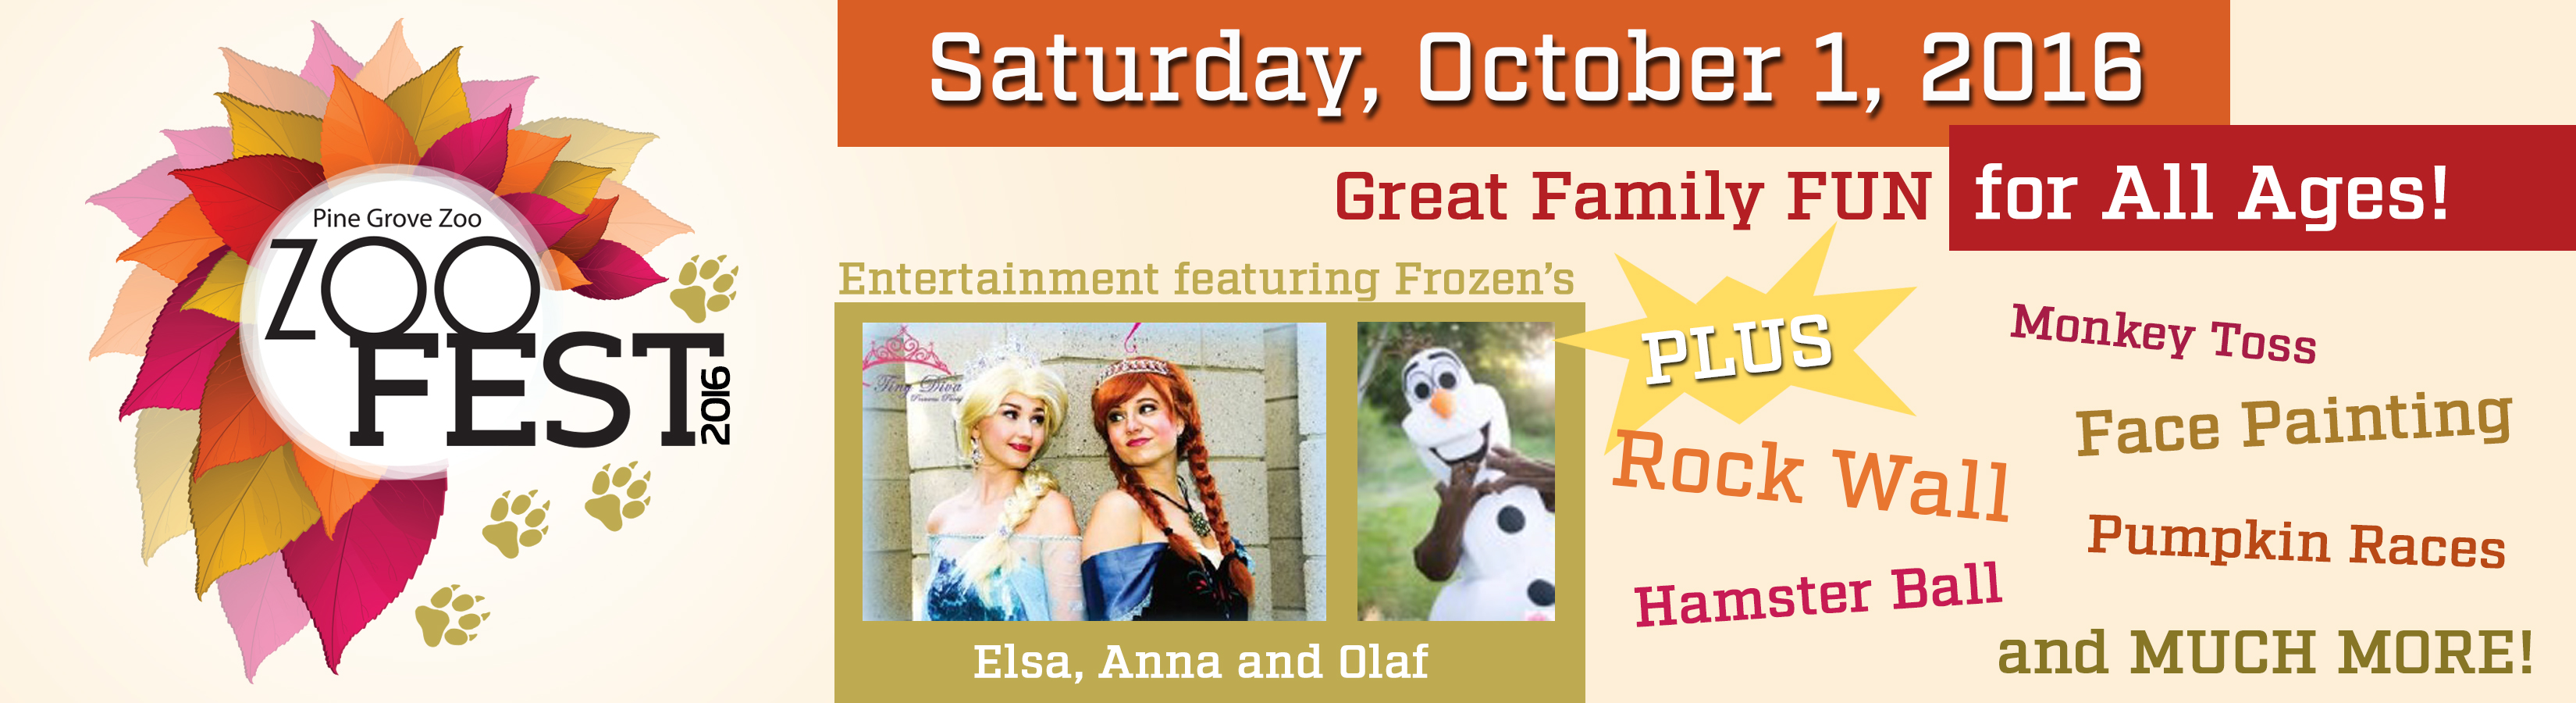 0517 PGZ Zoo Fest web banner